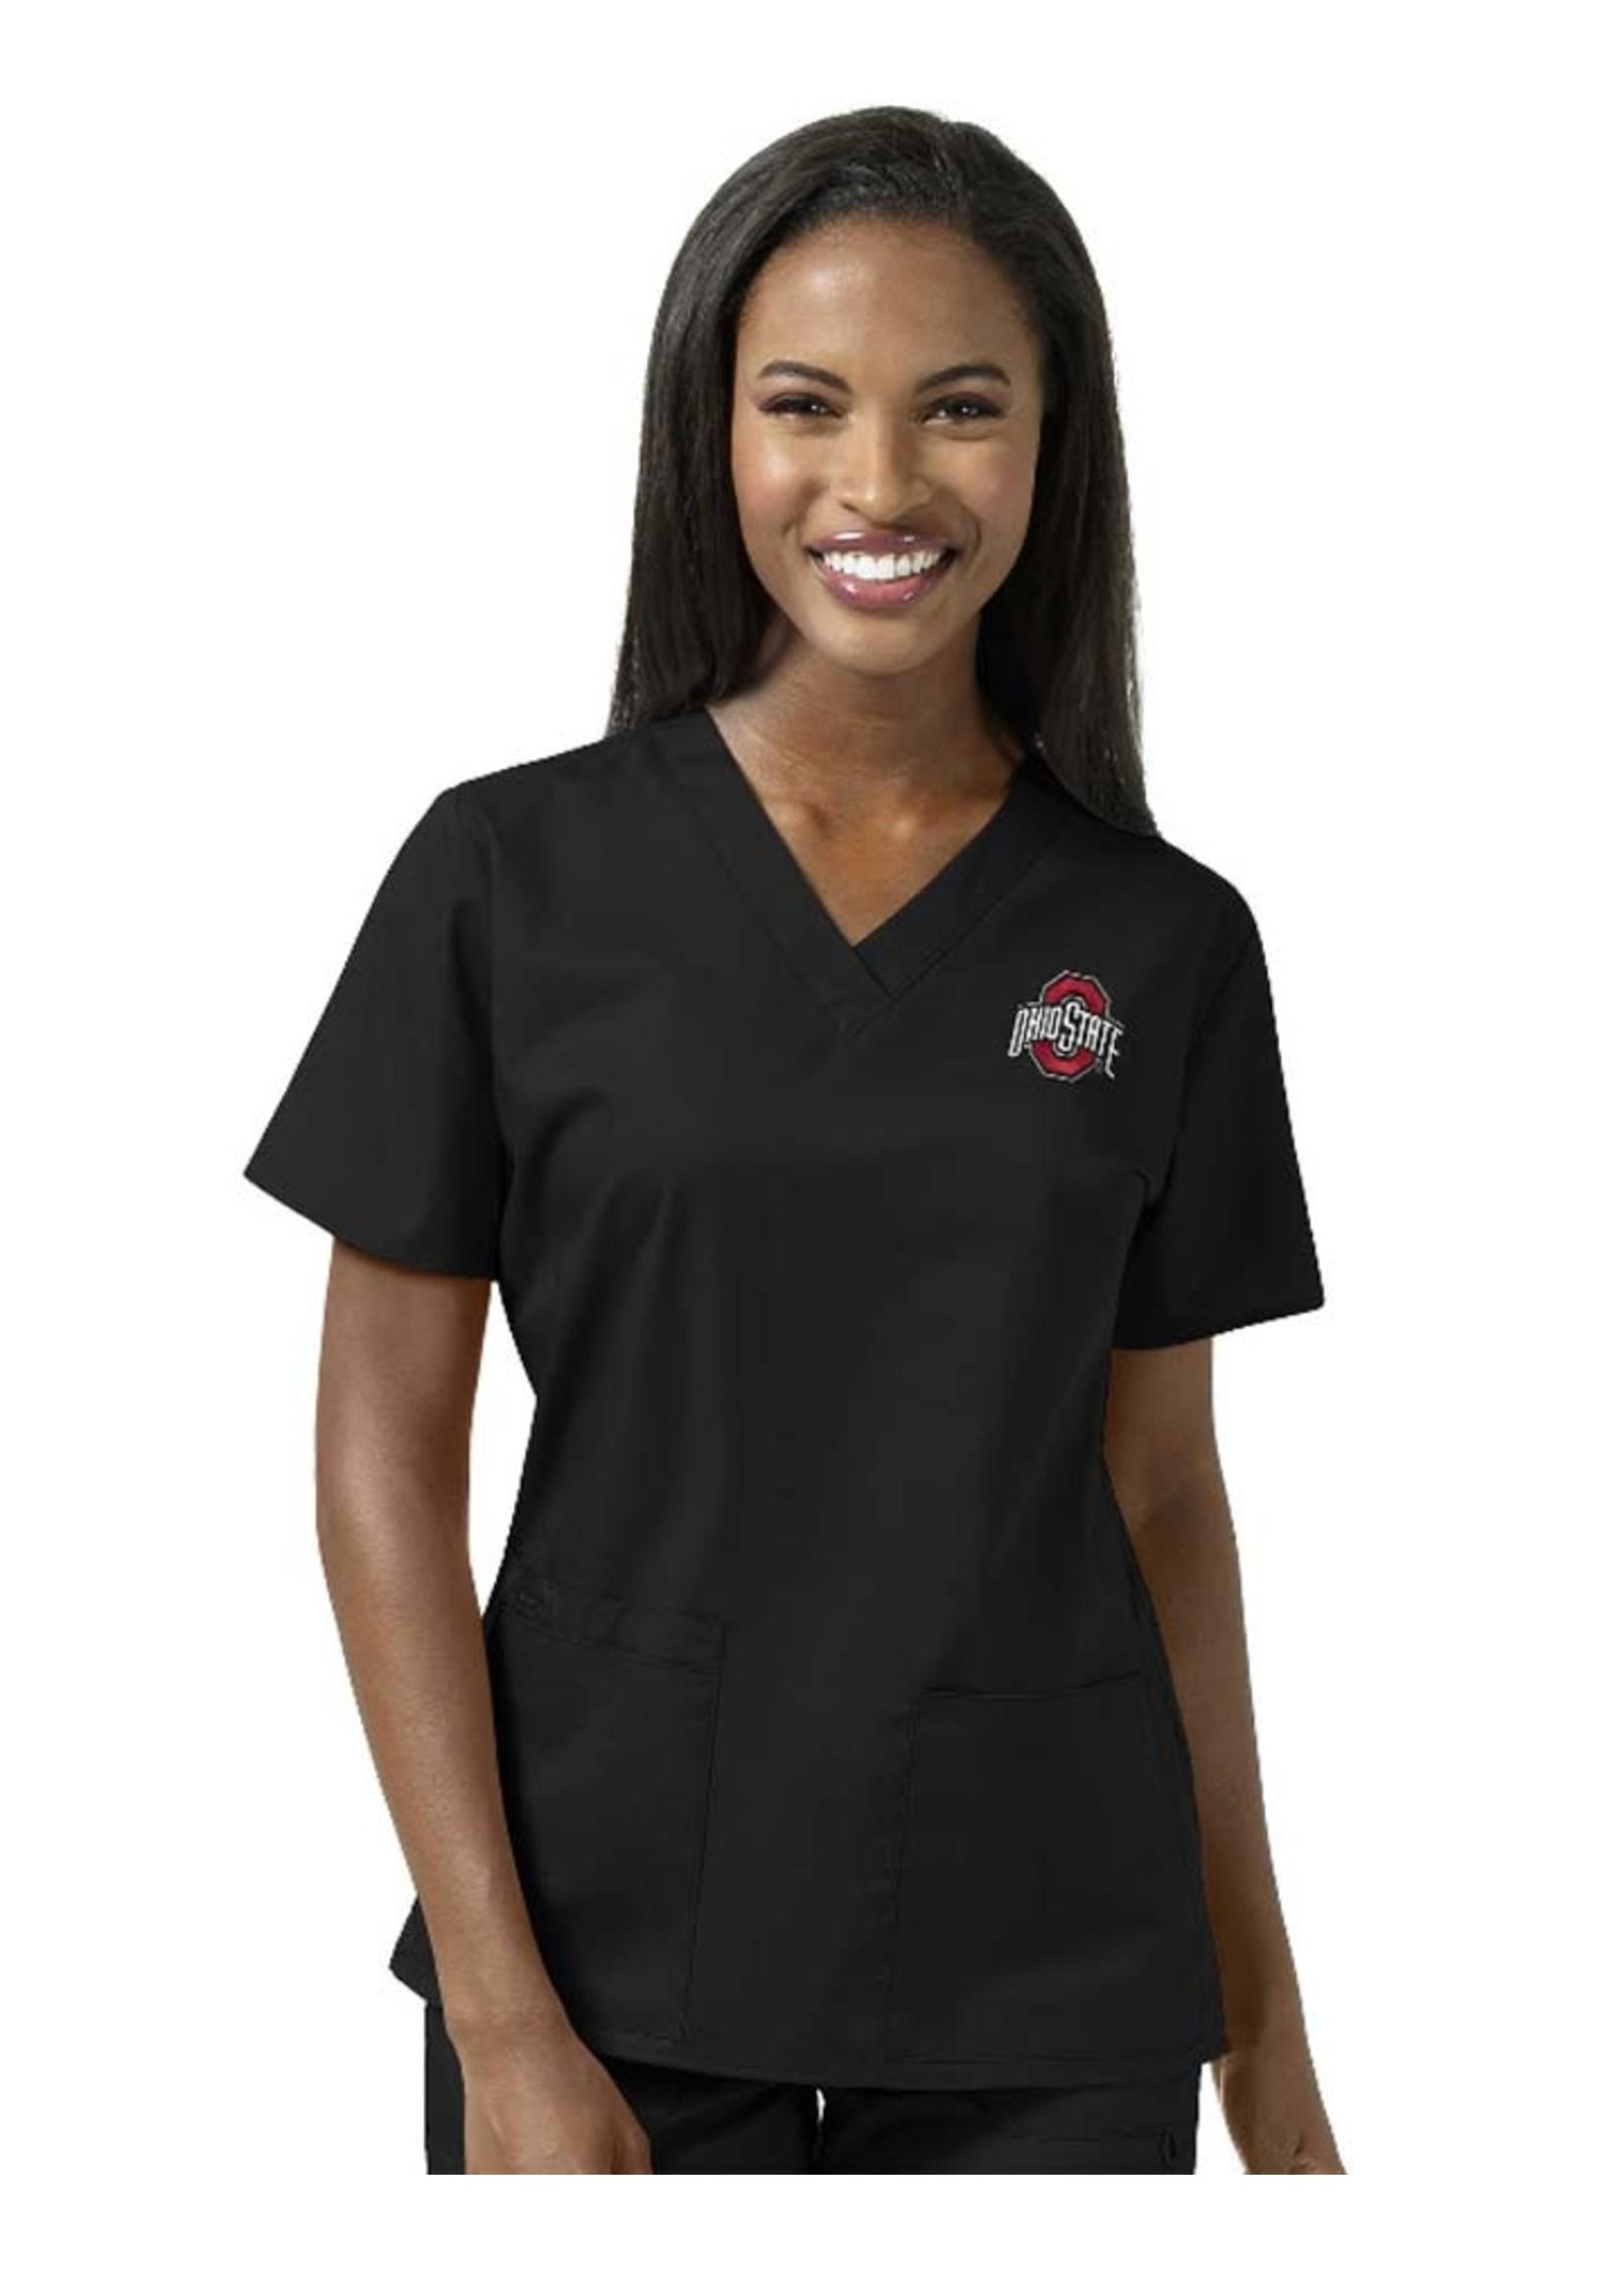 Wonder Wink Scrubs Ohio State Buckeyes Women's Scrubs V-Neck Top